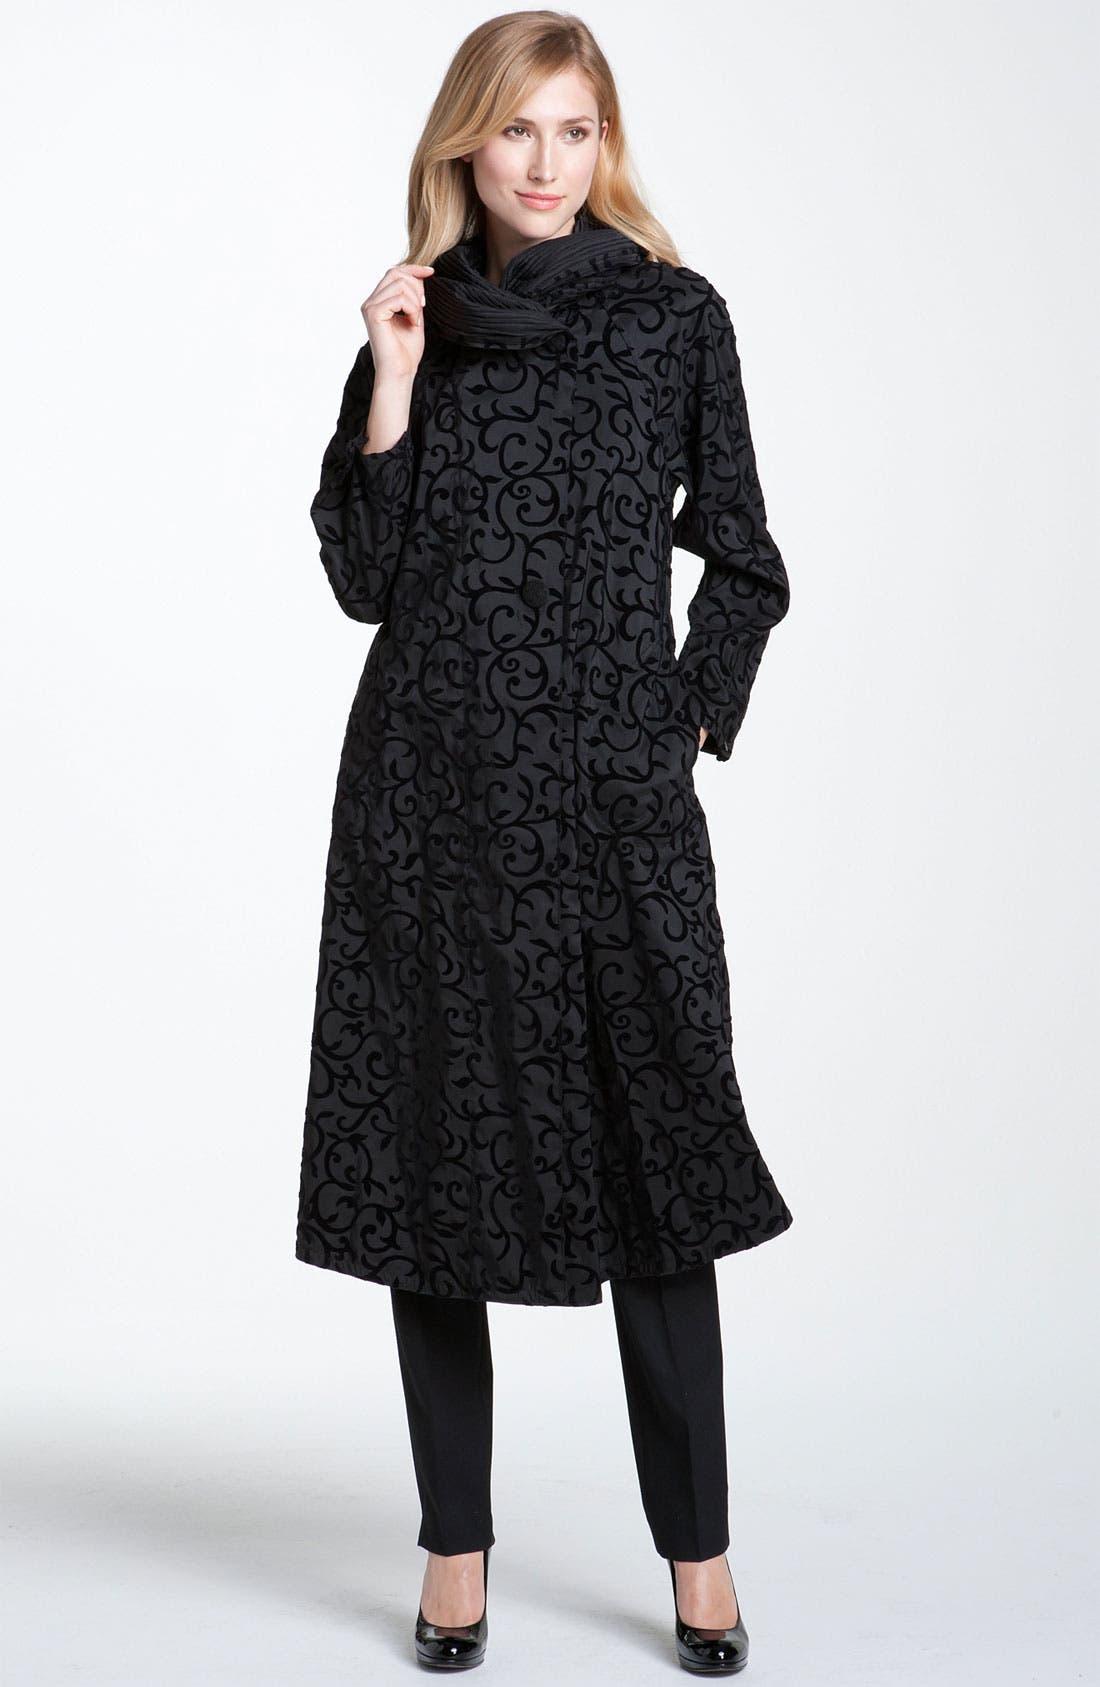 Main Image - Mycra Pac Designer Wear 'Donatella' Travel Coat